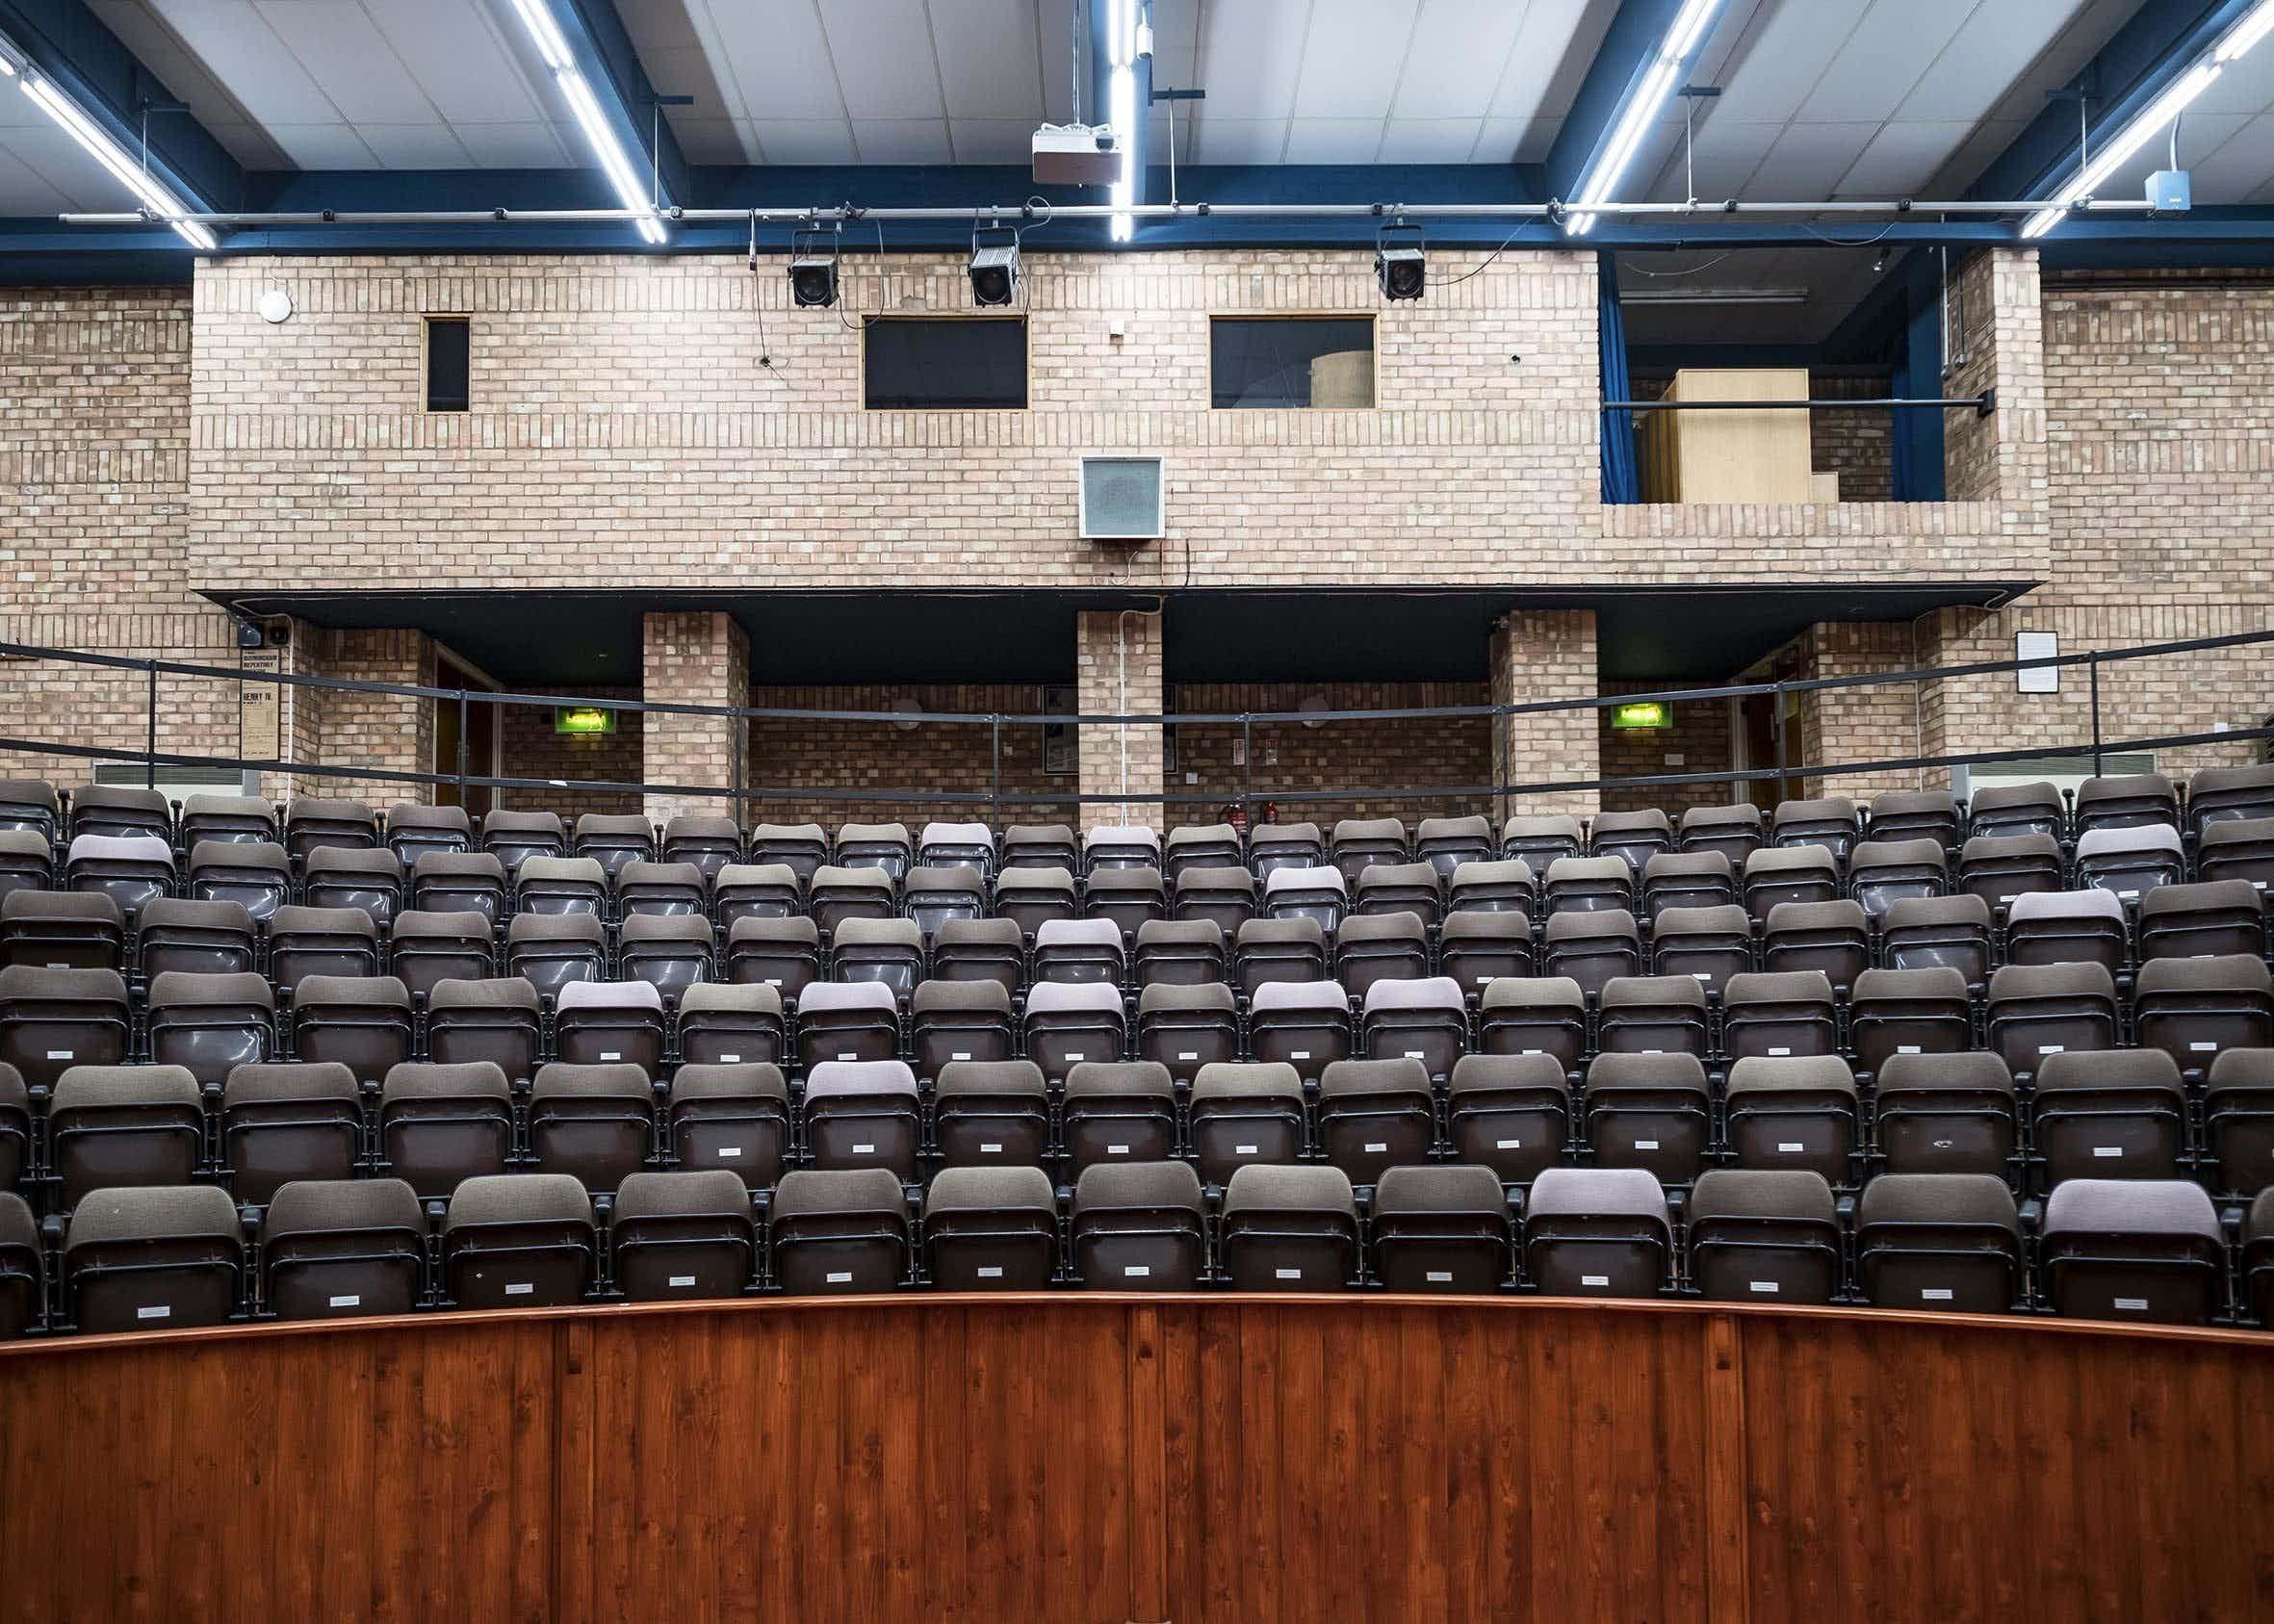 The Lyttelton Theatre, The Birmingham and Midland Institute